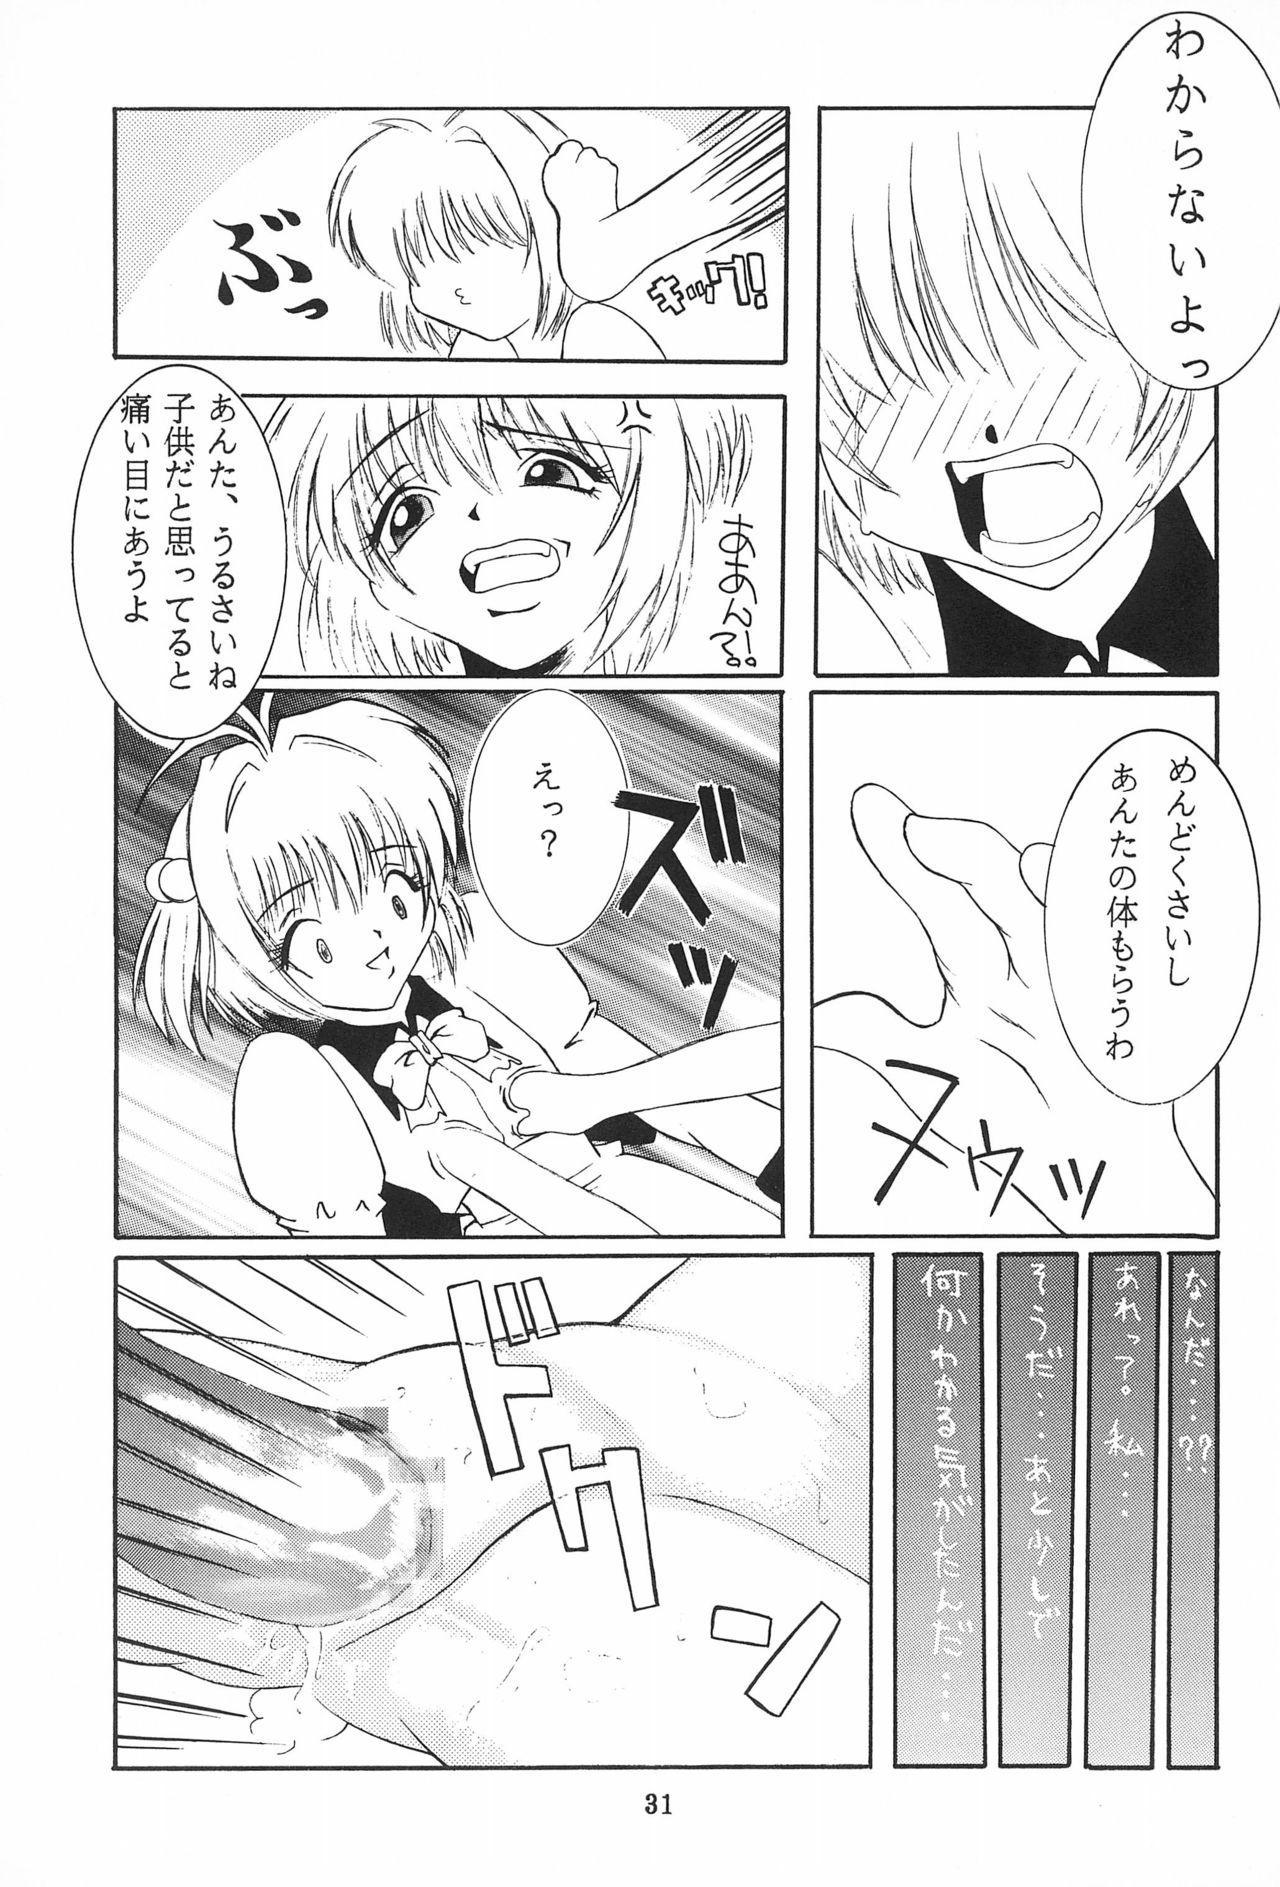 Magokoro o Kimi ni 30